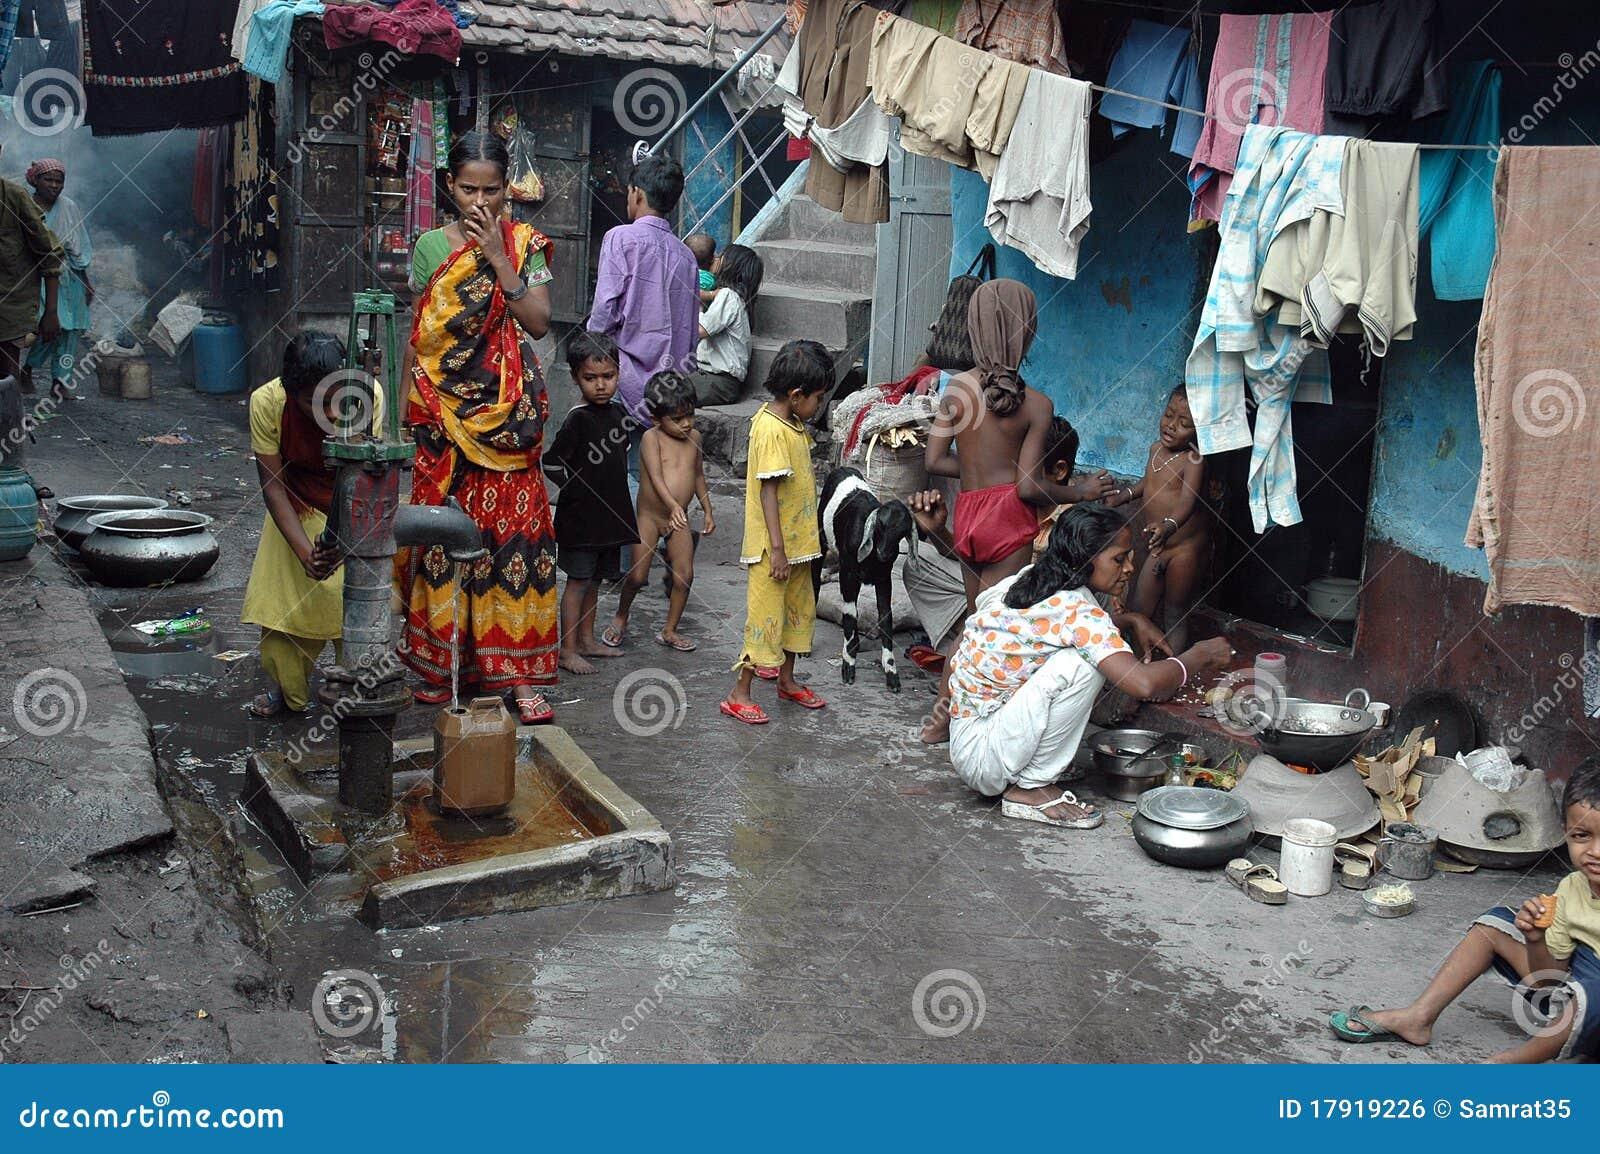 Slum Dwellers Of Kolkata-India Editorial Photo - Image ...